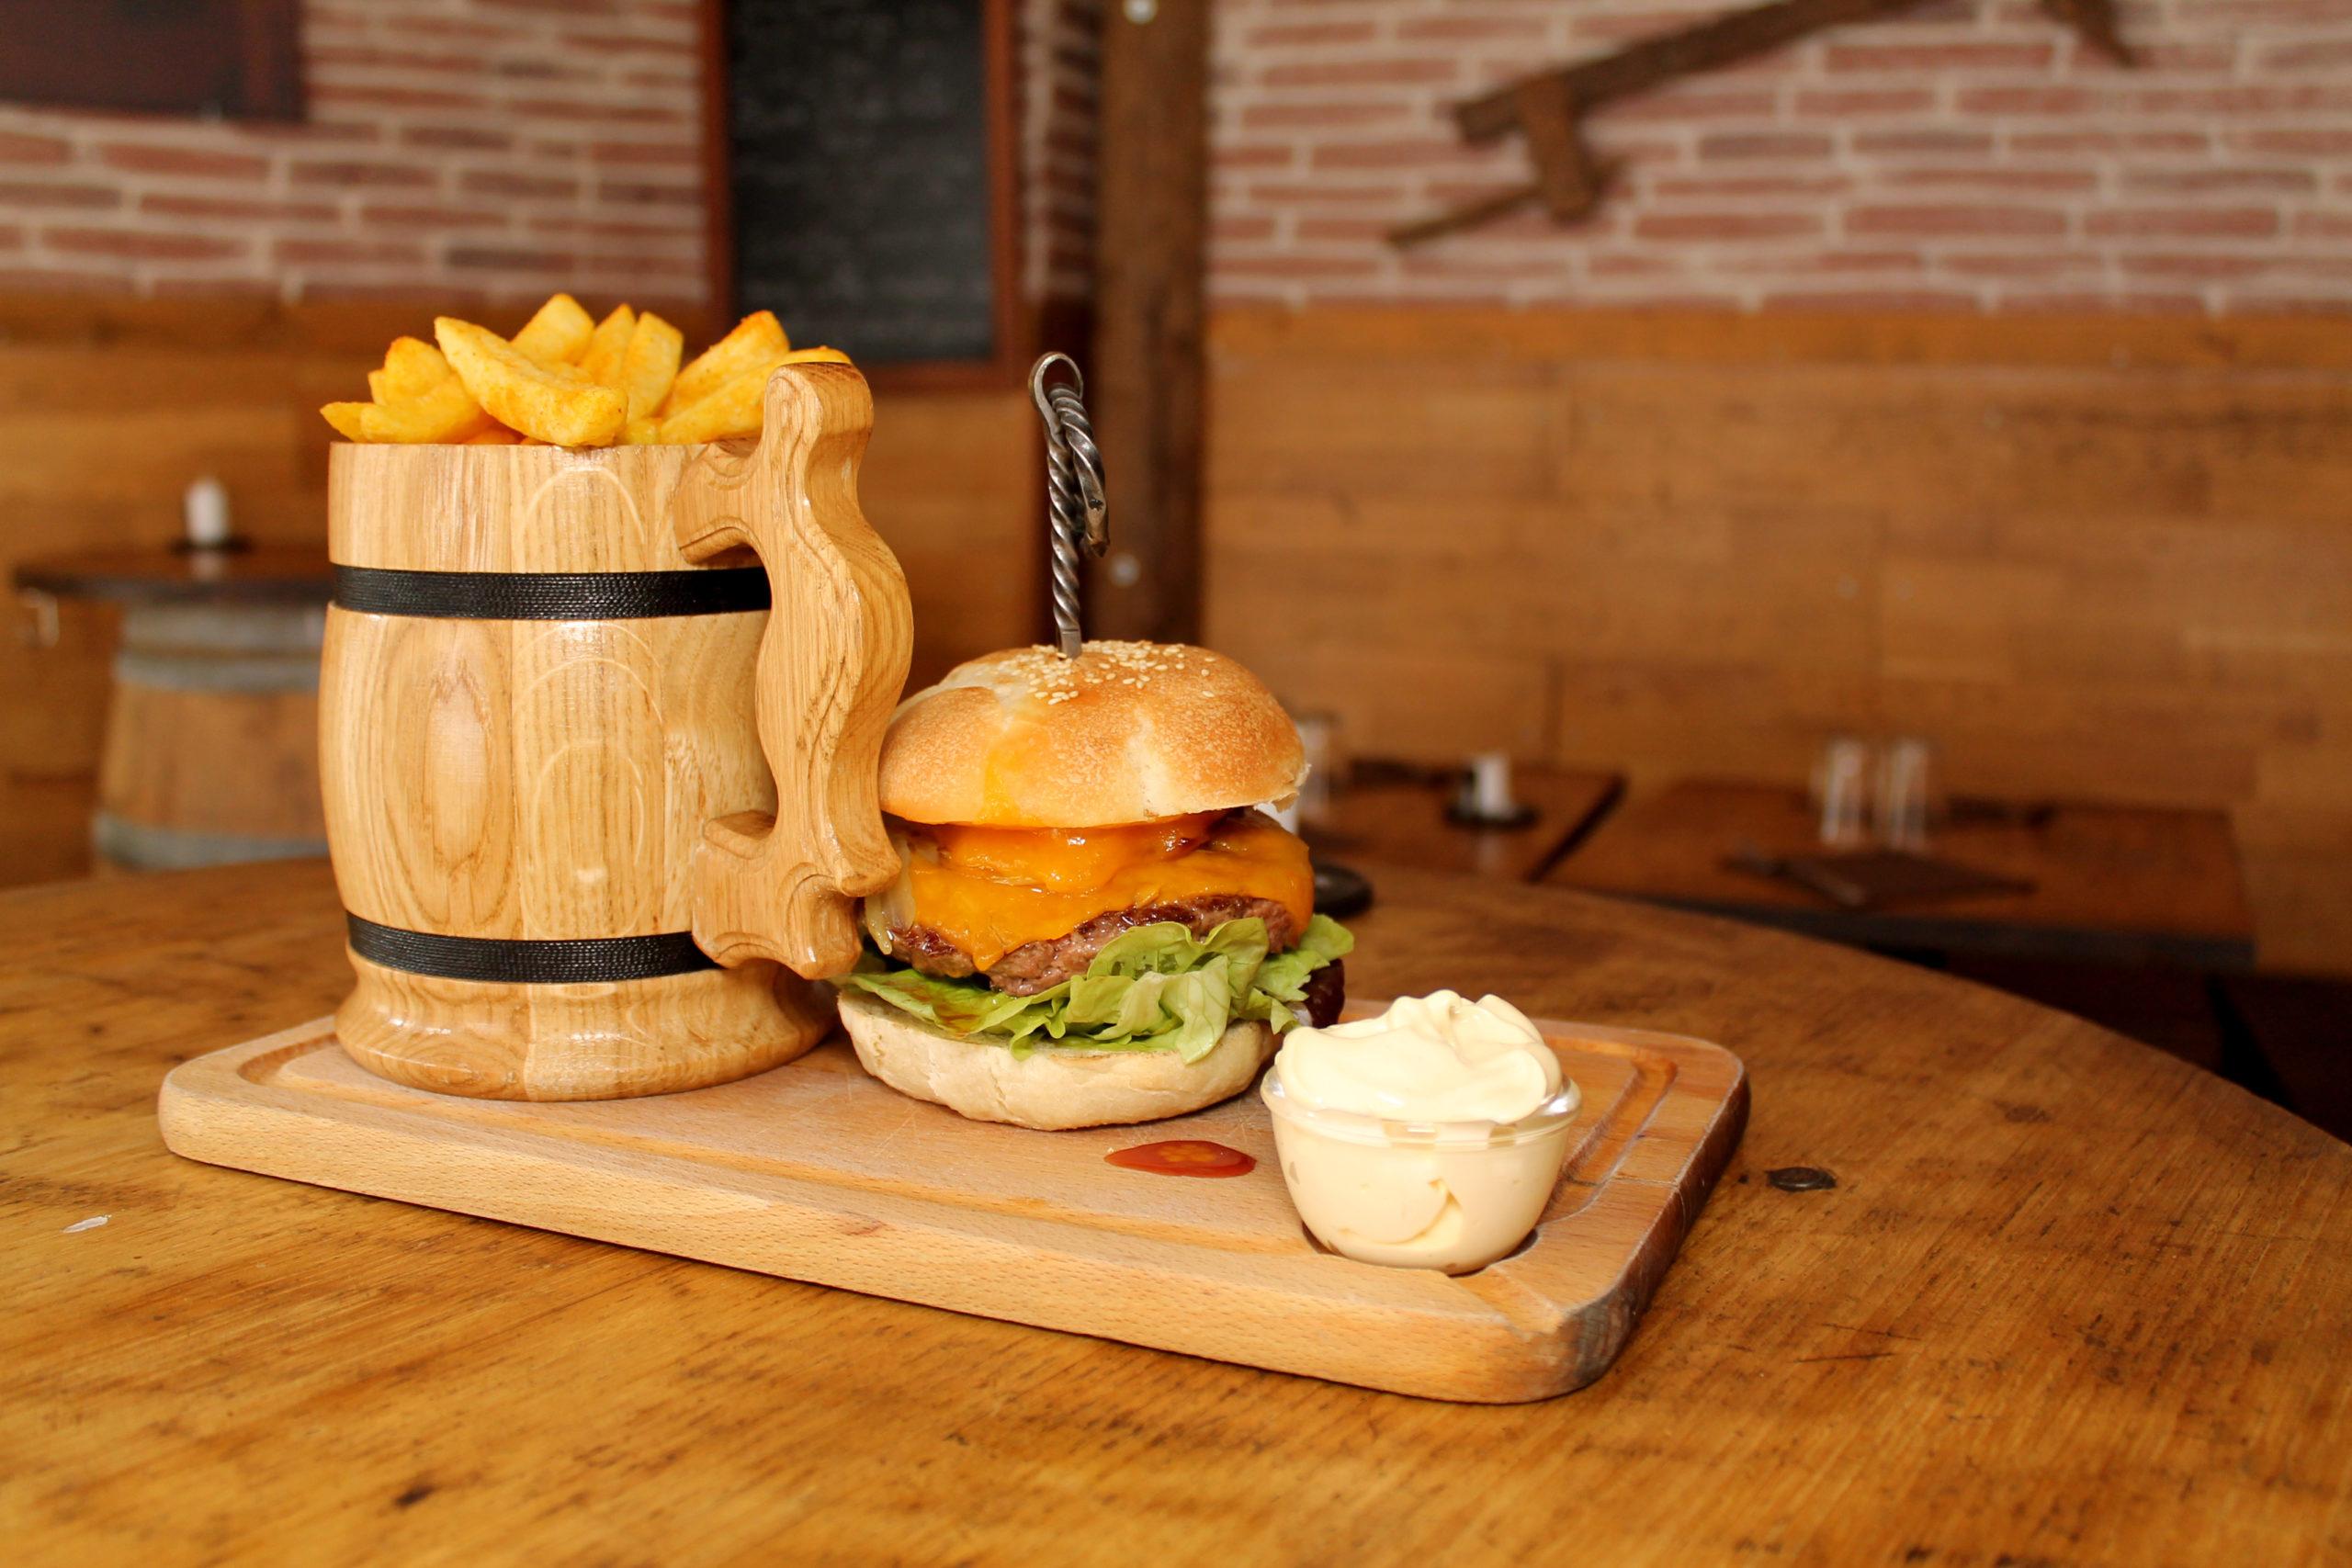 Menu Burger - Prise par Nob Guérin